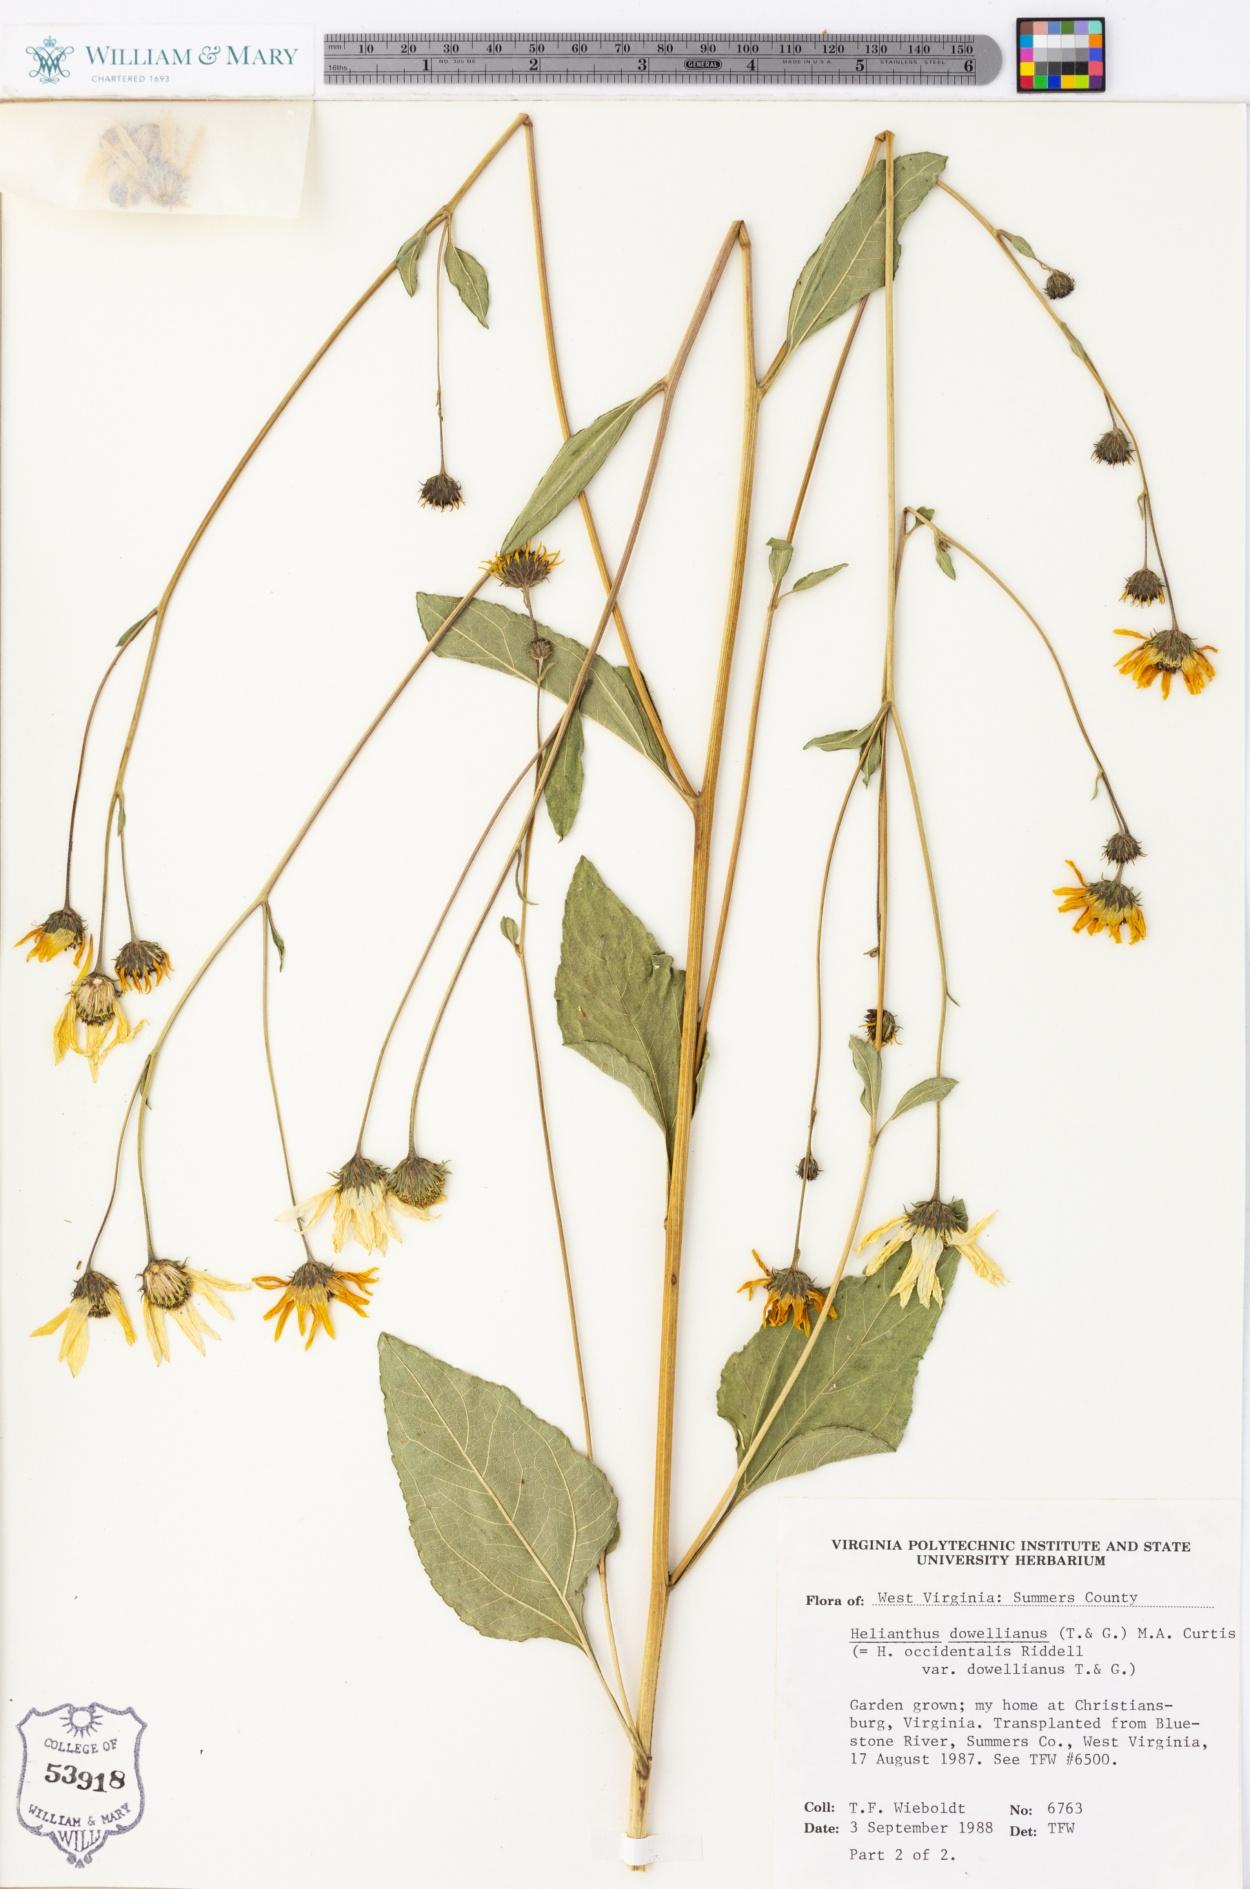 Helianthus dowellianus image